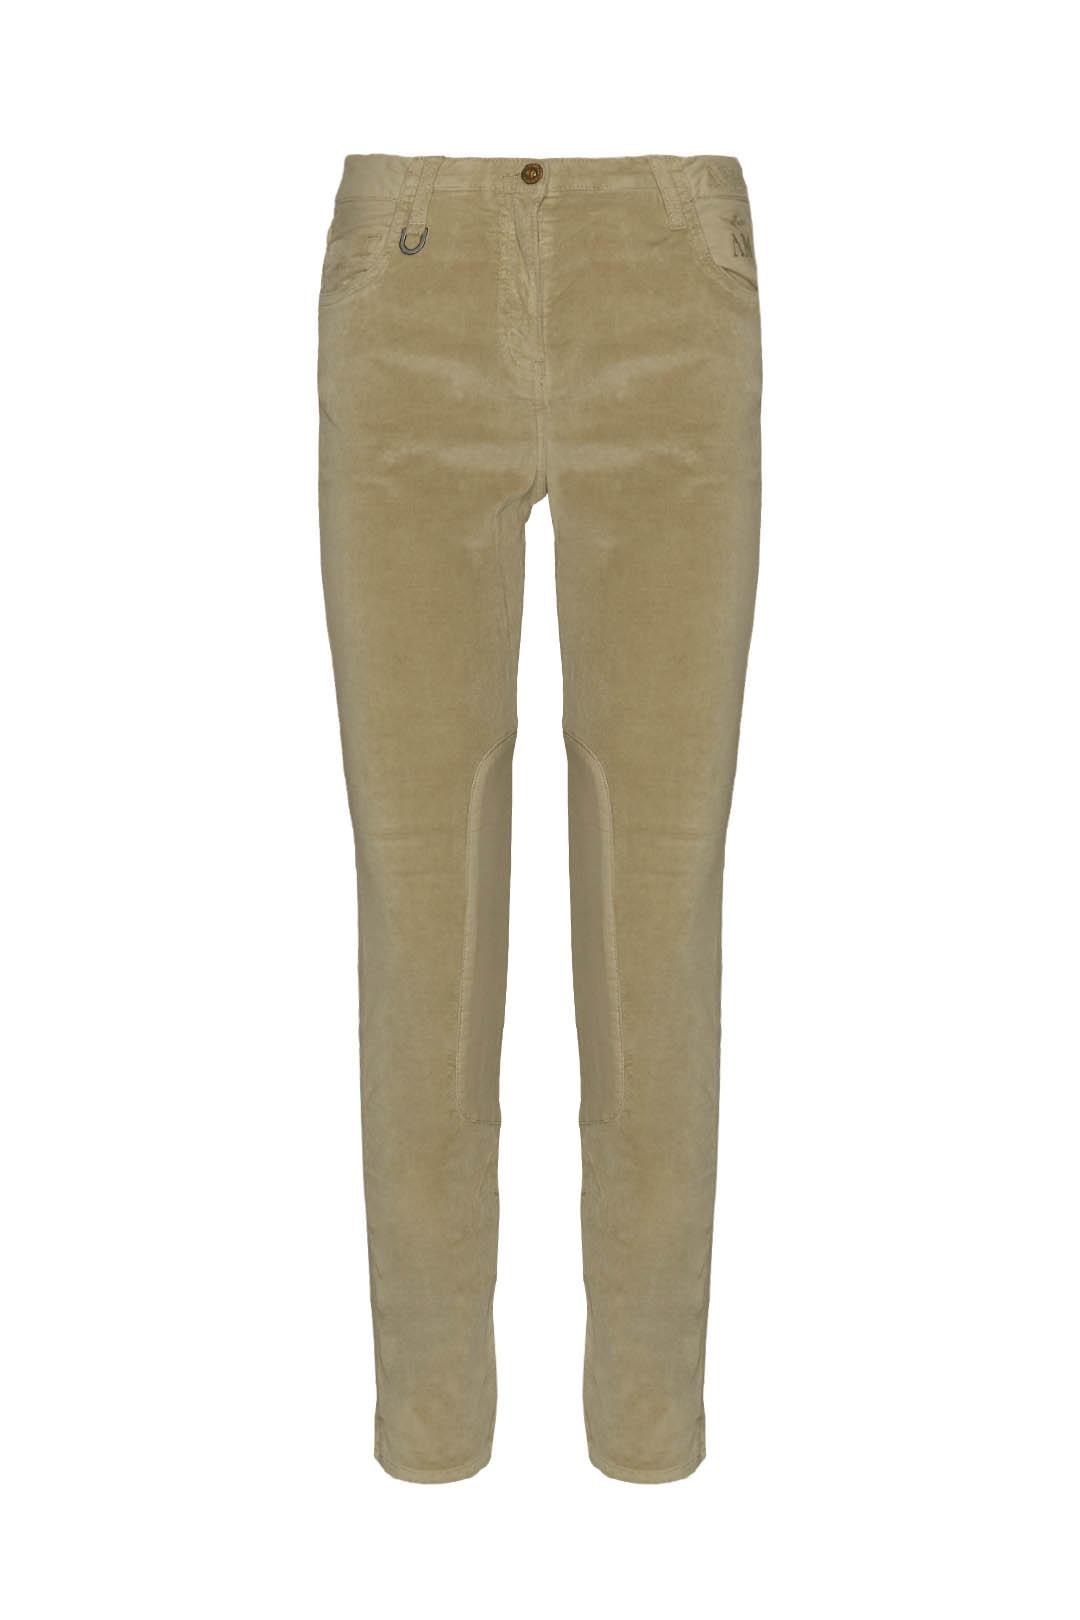 Pantalon à 5 poches en velours           1